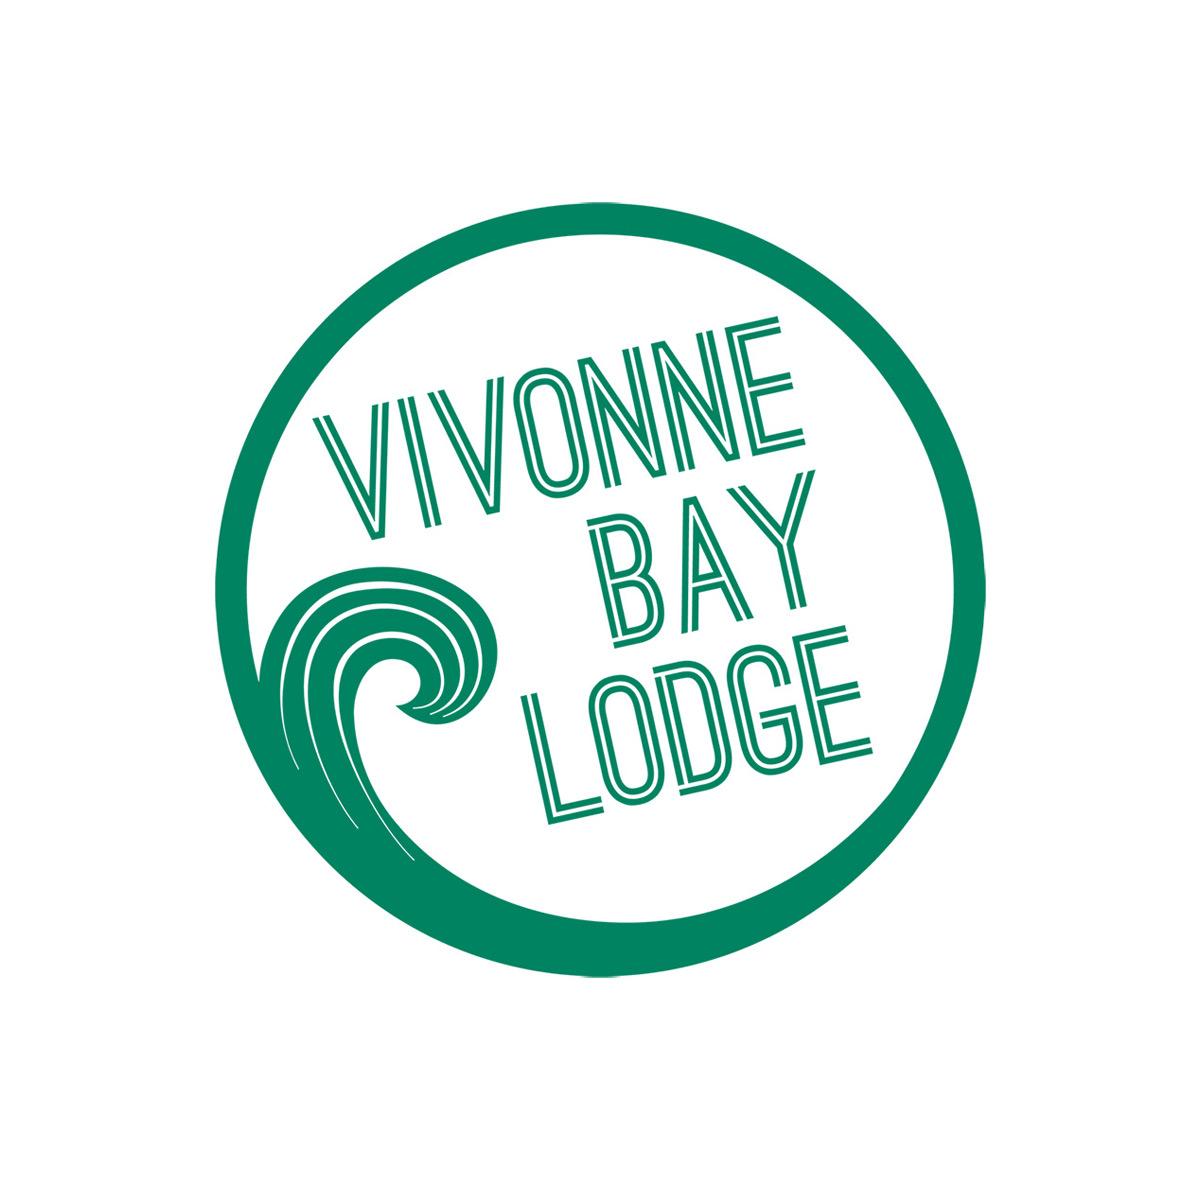 Square logo vivonne bay lodge